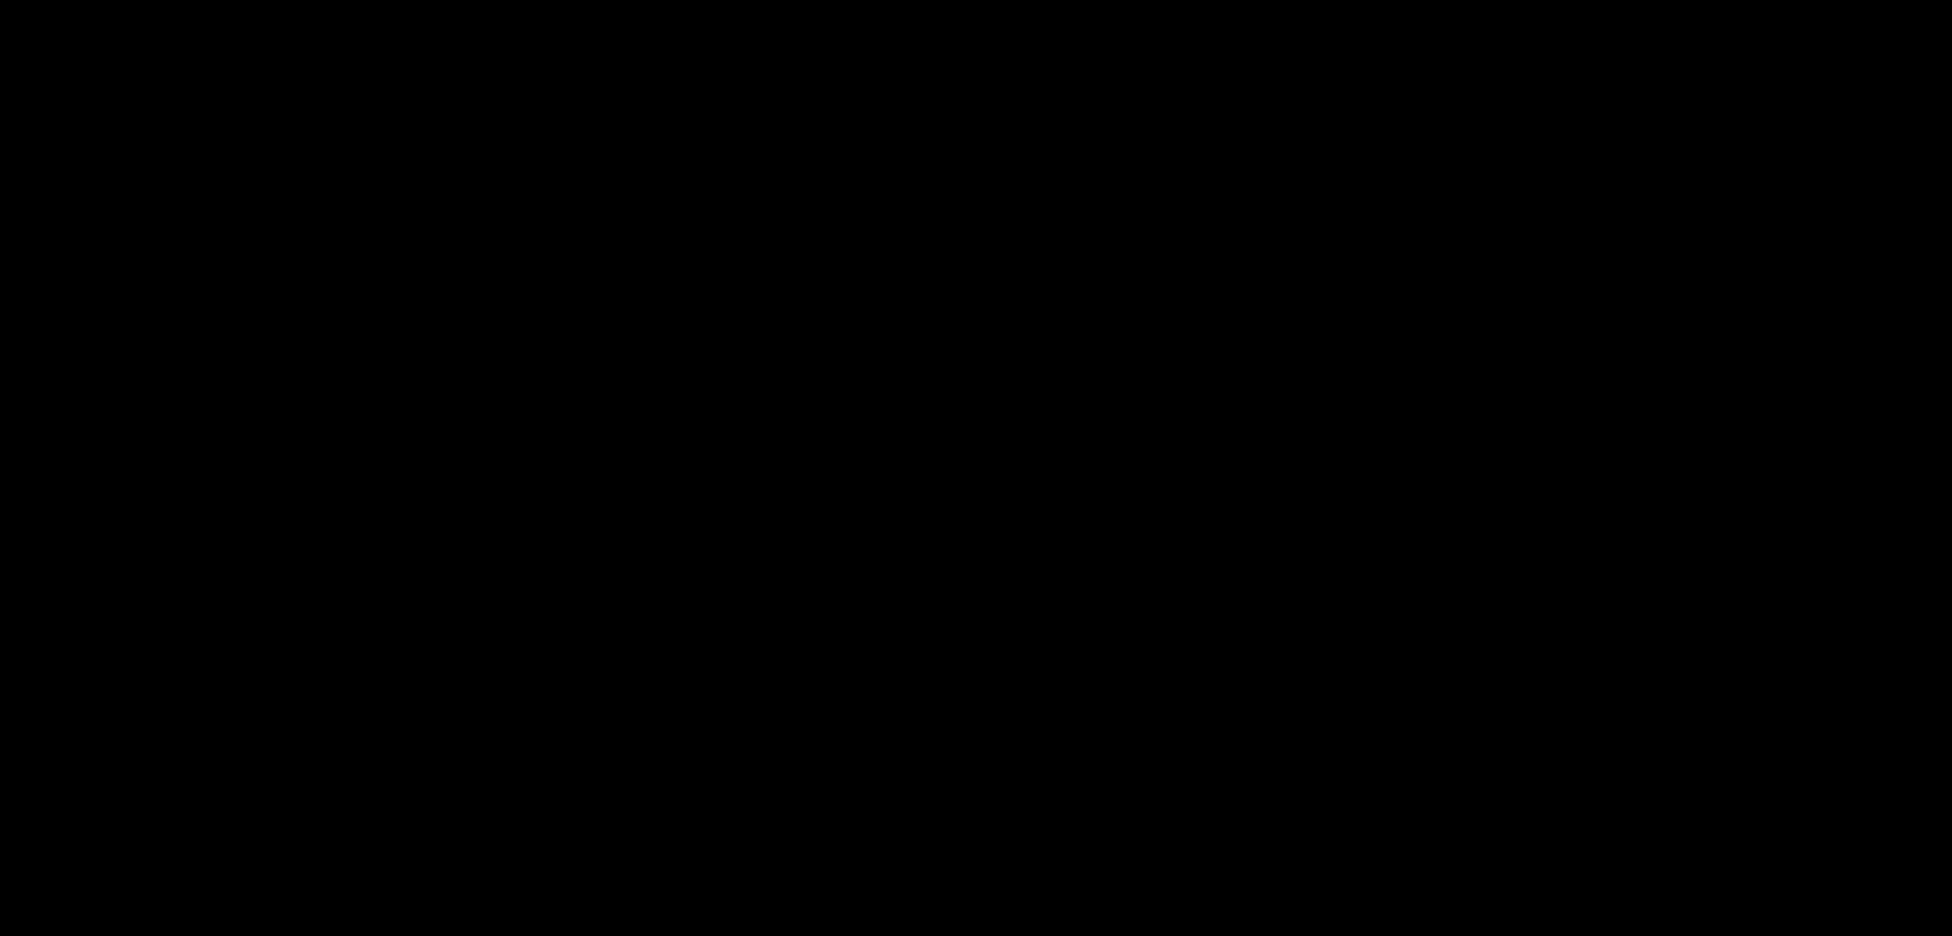 Helvetica Neue Font Image